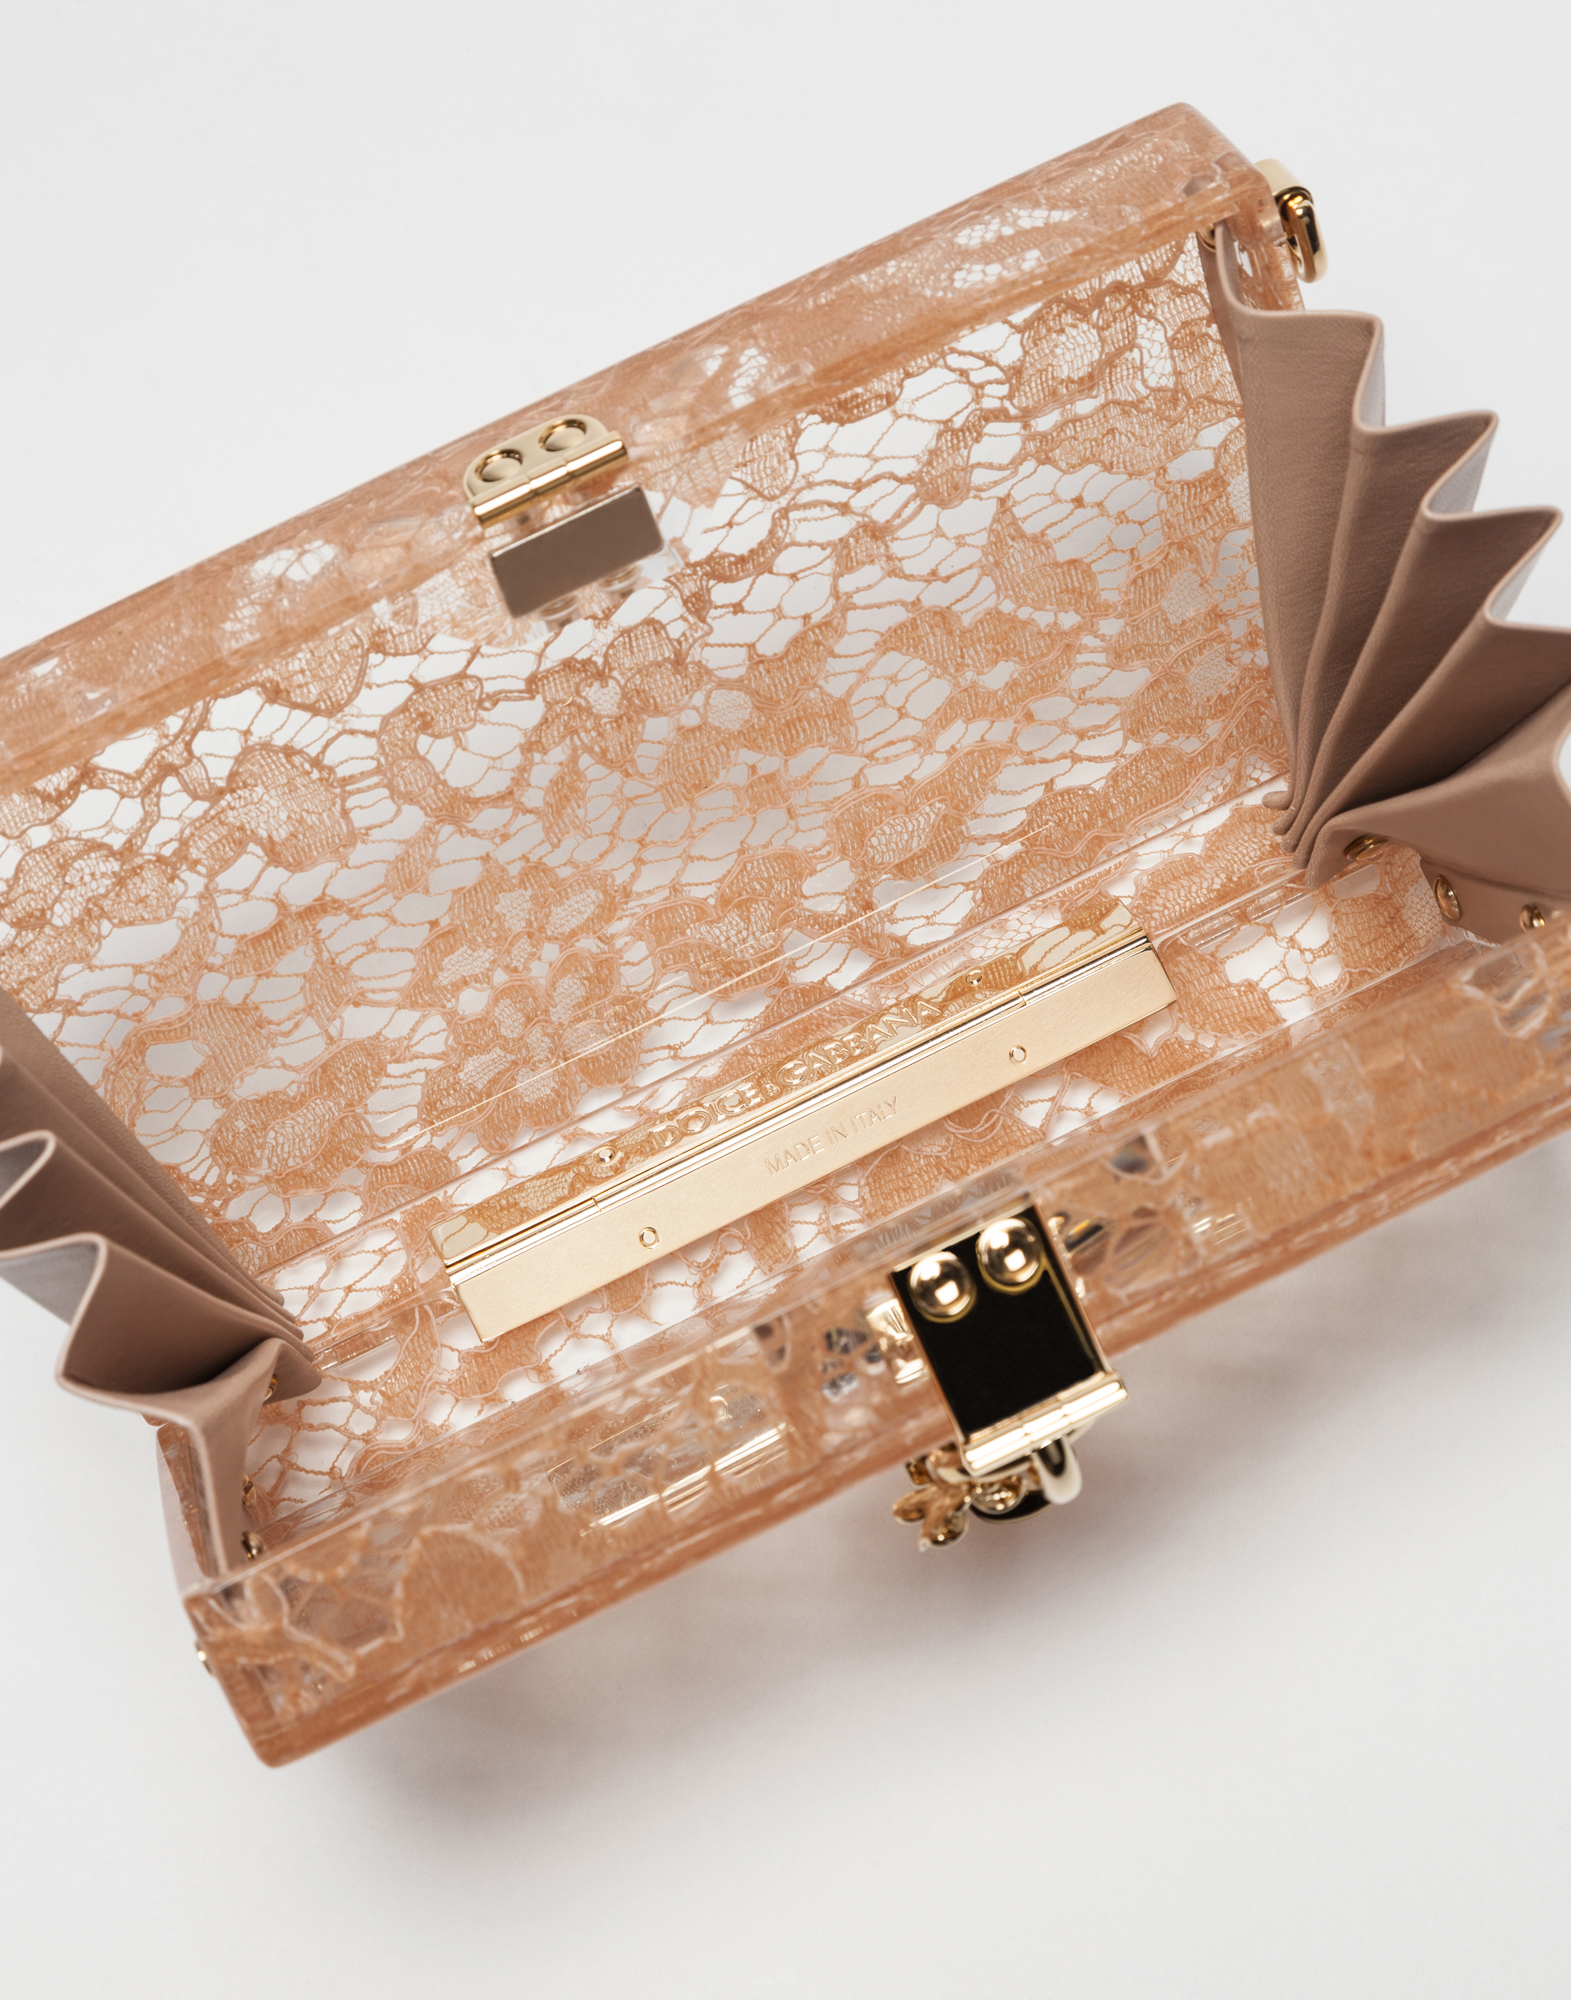 Dolce&Gabbana DOLCE BOX CLUTCH IN PLEXIGLASS AND LACE